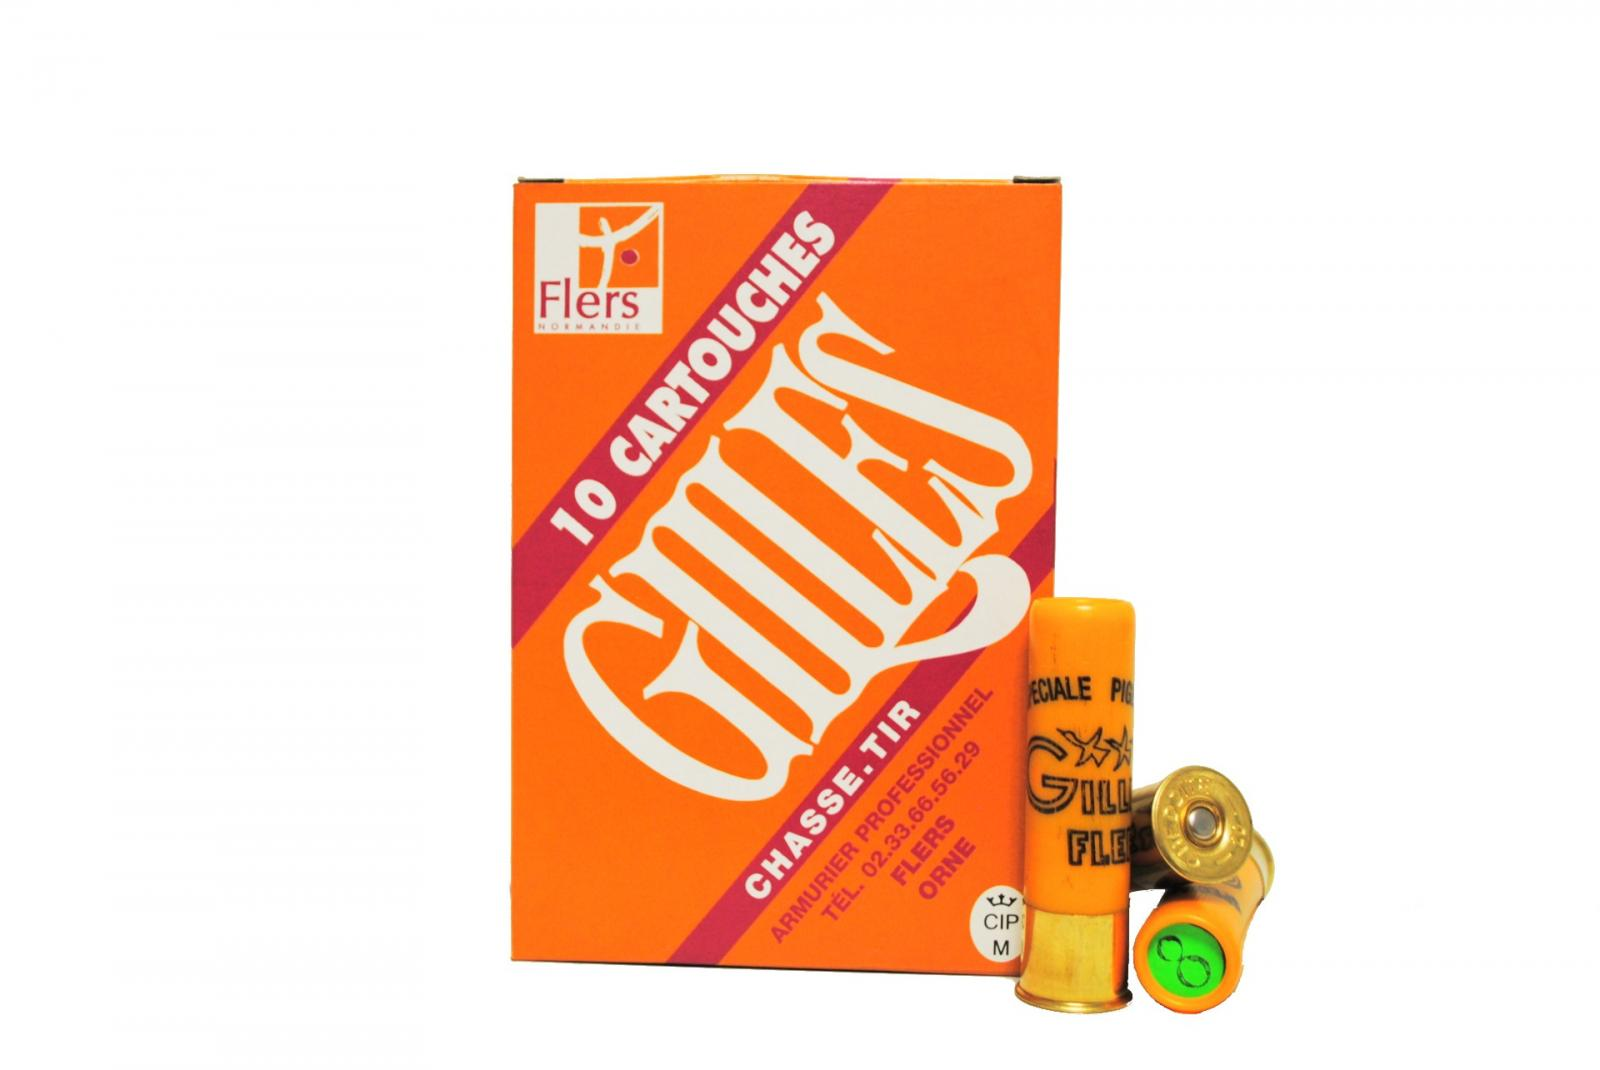 Boite de 10 cartouches GILLES 20 / 70 grand culot 28 grs Bourre GRASSE SUPER D3